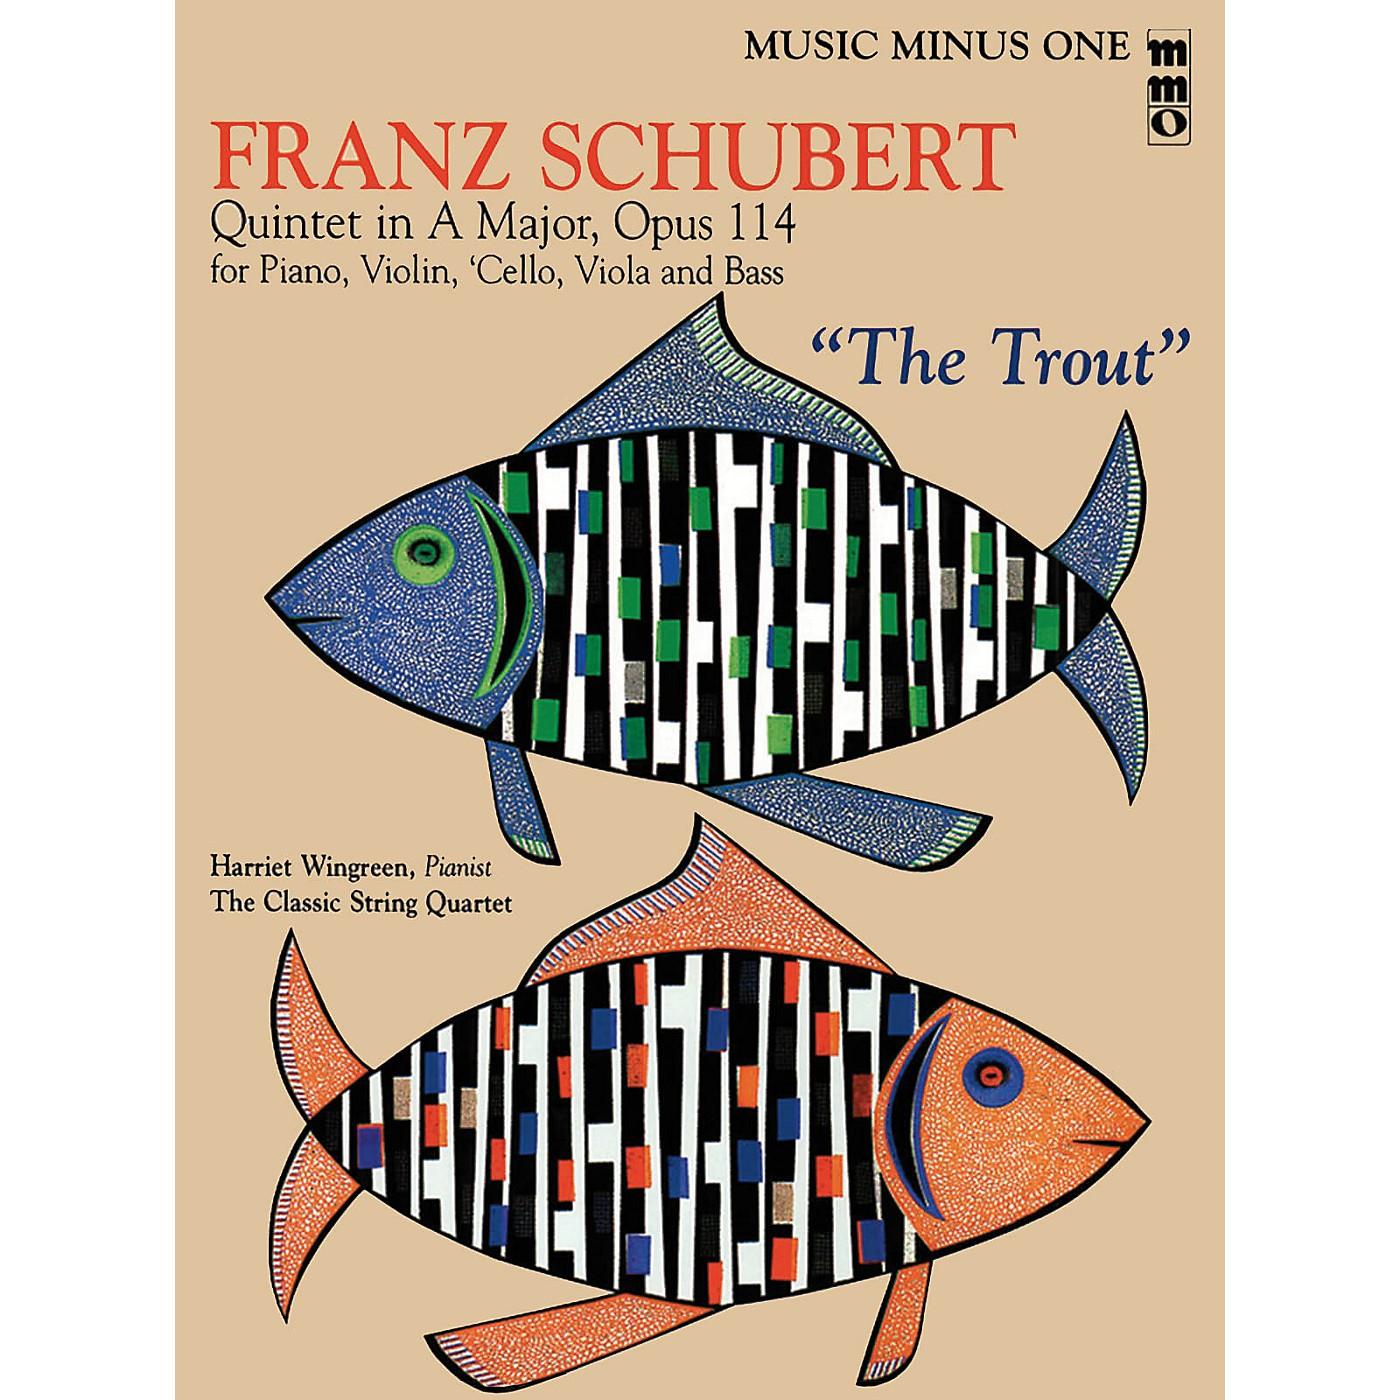 Music Minus One Franz Schubert - Quintet in A Major, Op. 114 or The Trout Music Minus One BK/CD by Franz Schubert thumbnail